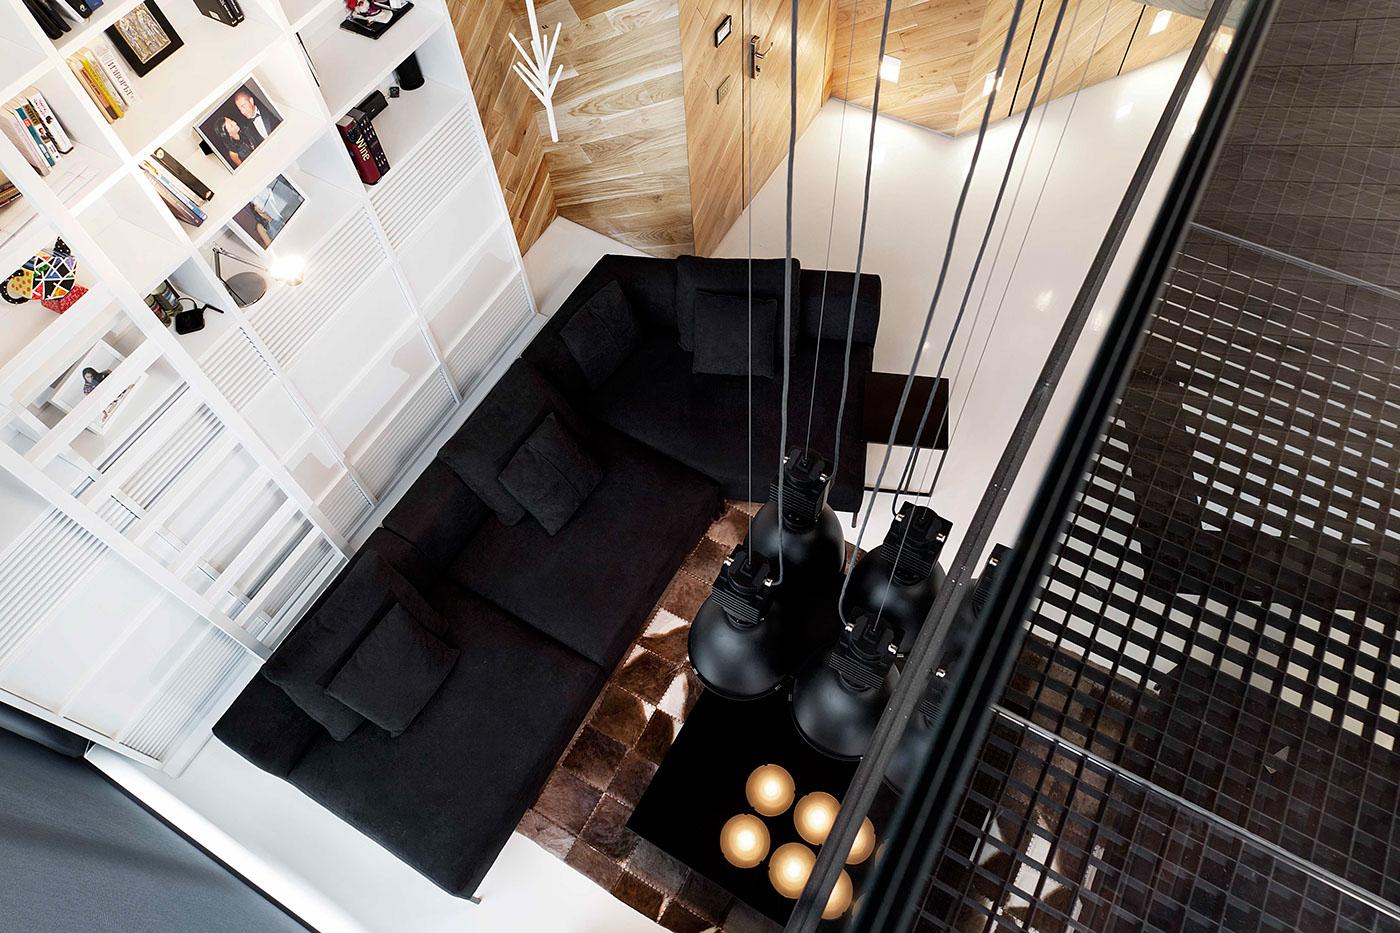 studio mode3 Loft Apartment By Studio Mode